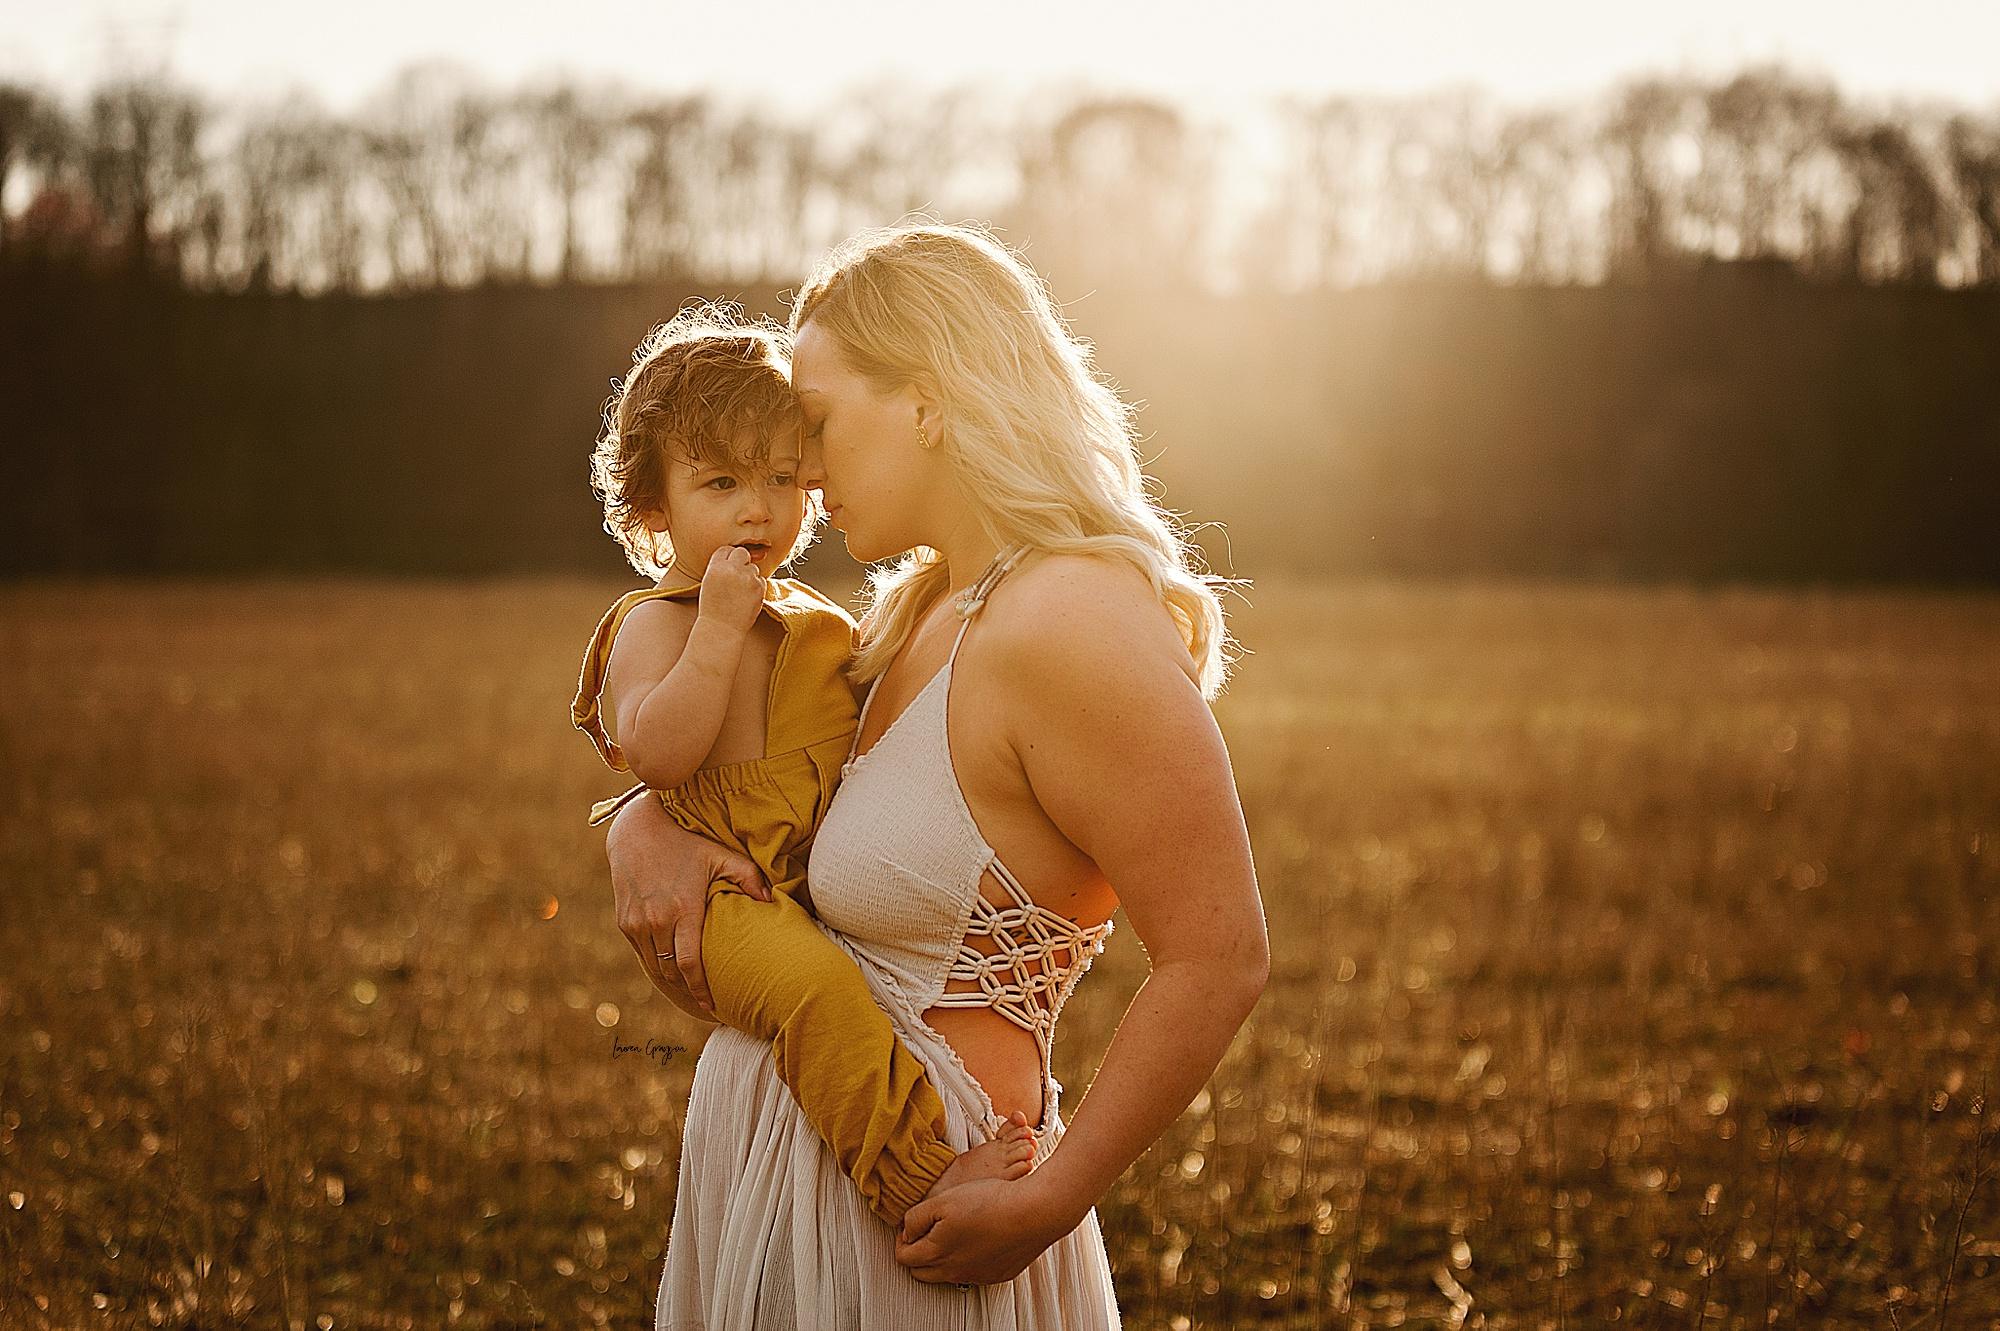 lauren-grayson-photography-akron-ohio-family-mom-boys-field-spring-outdoor-session_0005.jpg